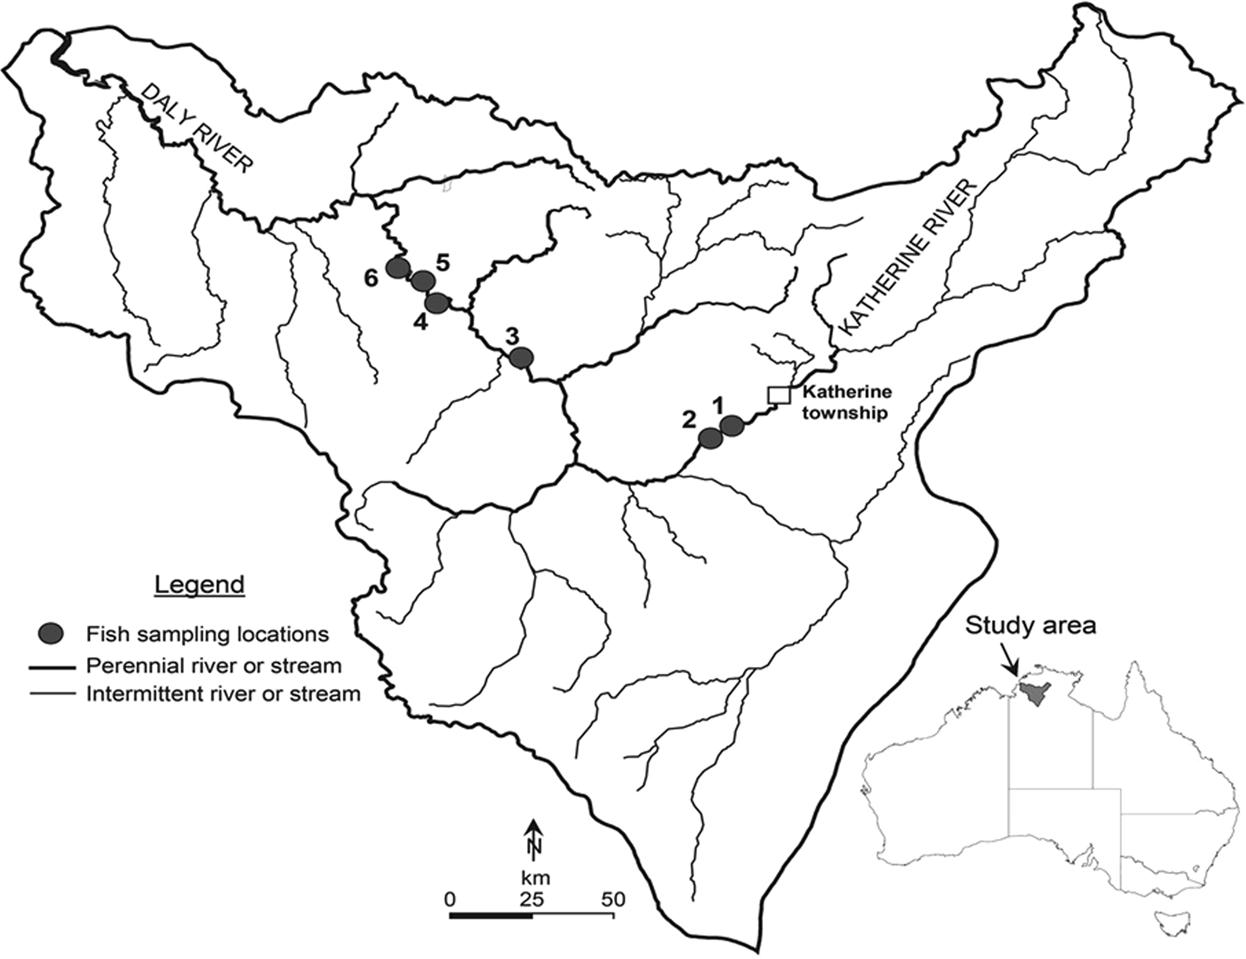 Dry season habitat use of fishes in an Australian tropical